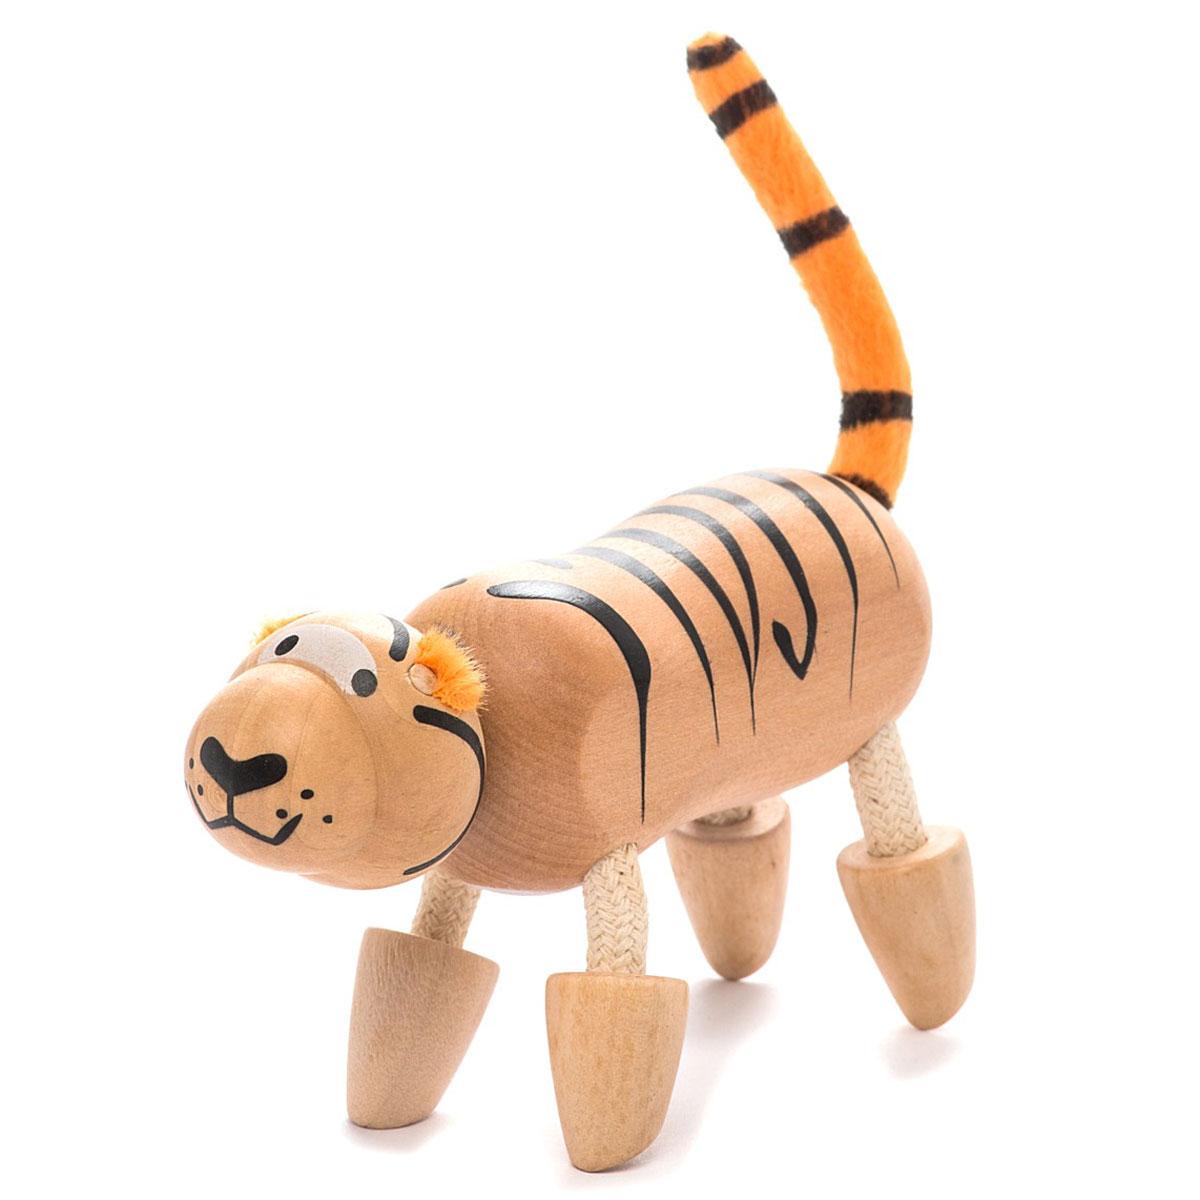 AnaMalz Фигурка деревянная Тигренок фигурки игрушки anamalz anamalz бурый мишка